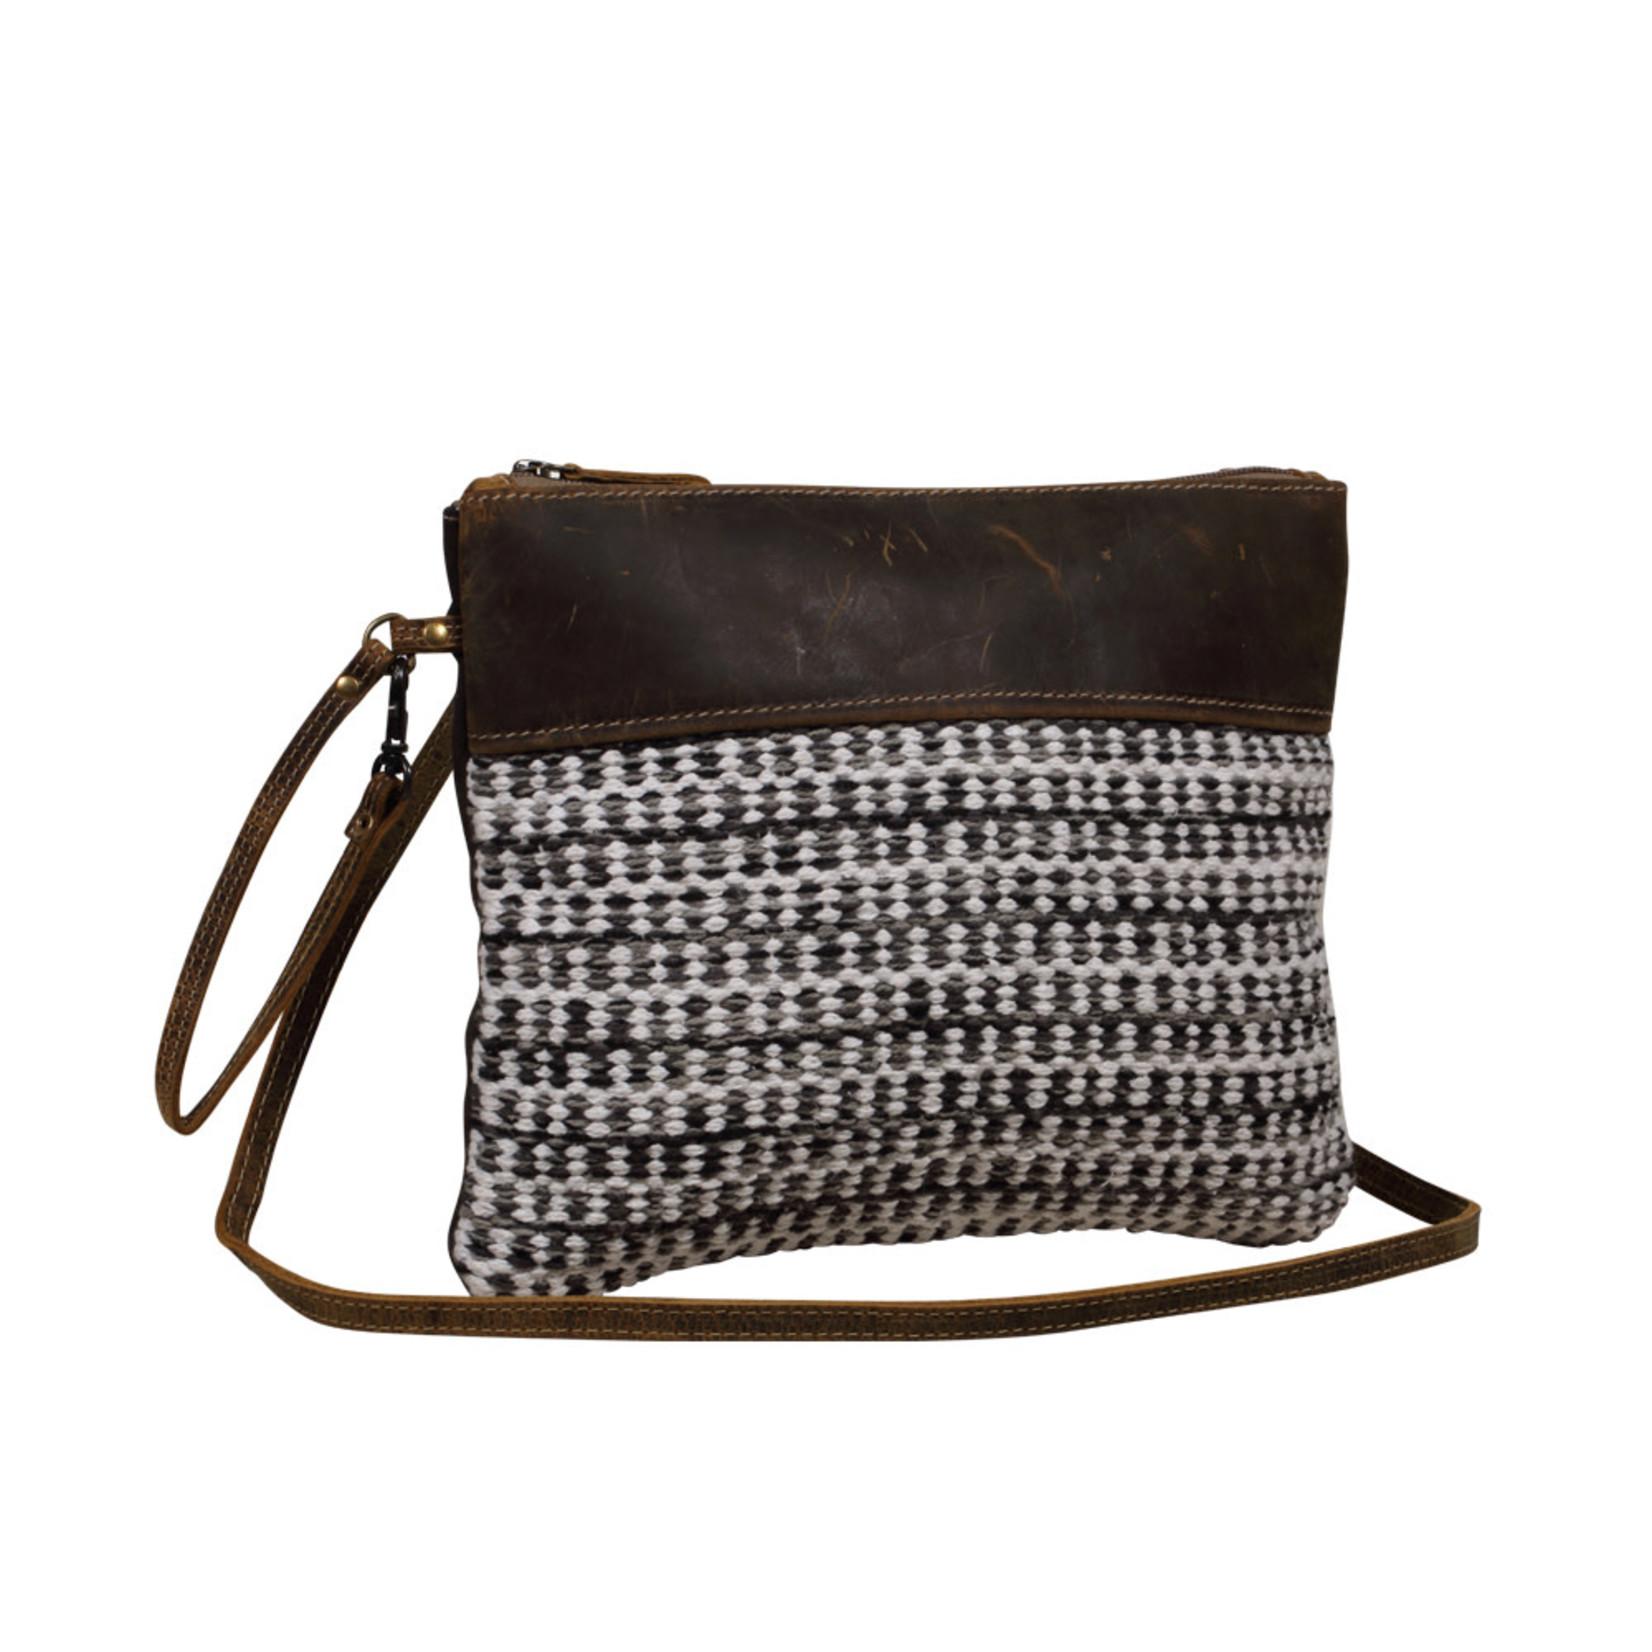 Myra Bags S-2035 Itty Bitty Small & Crossbody Bag